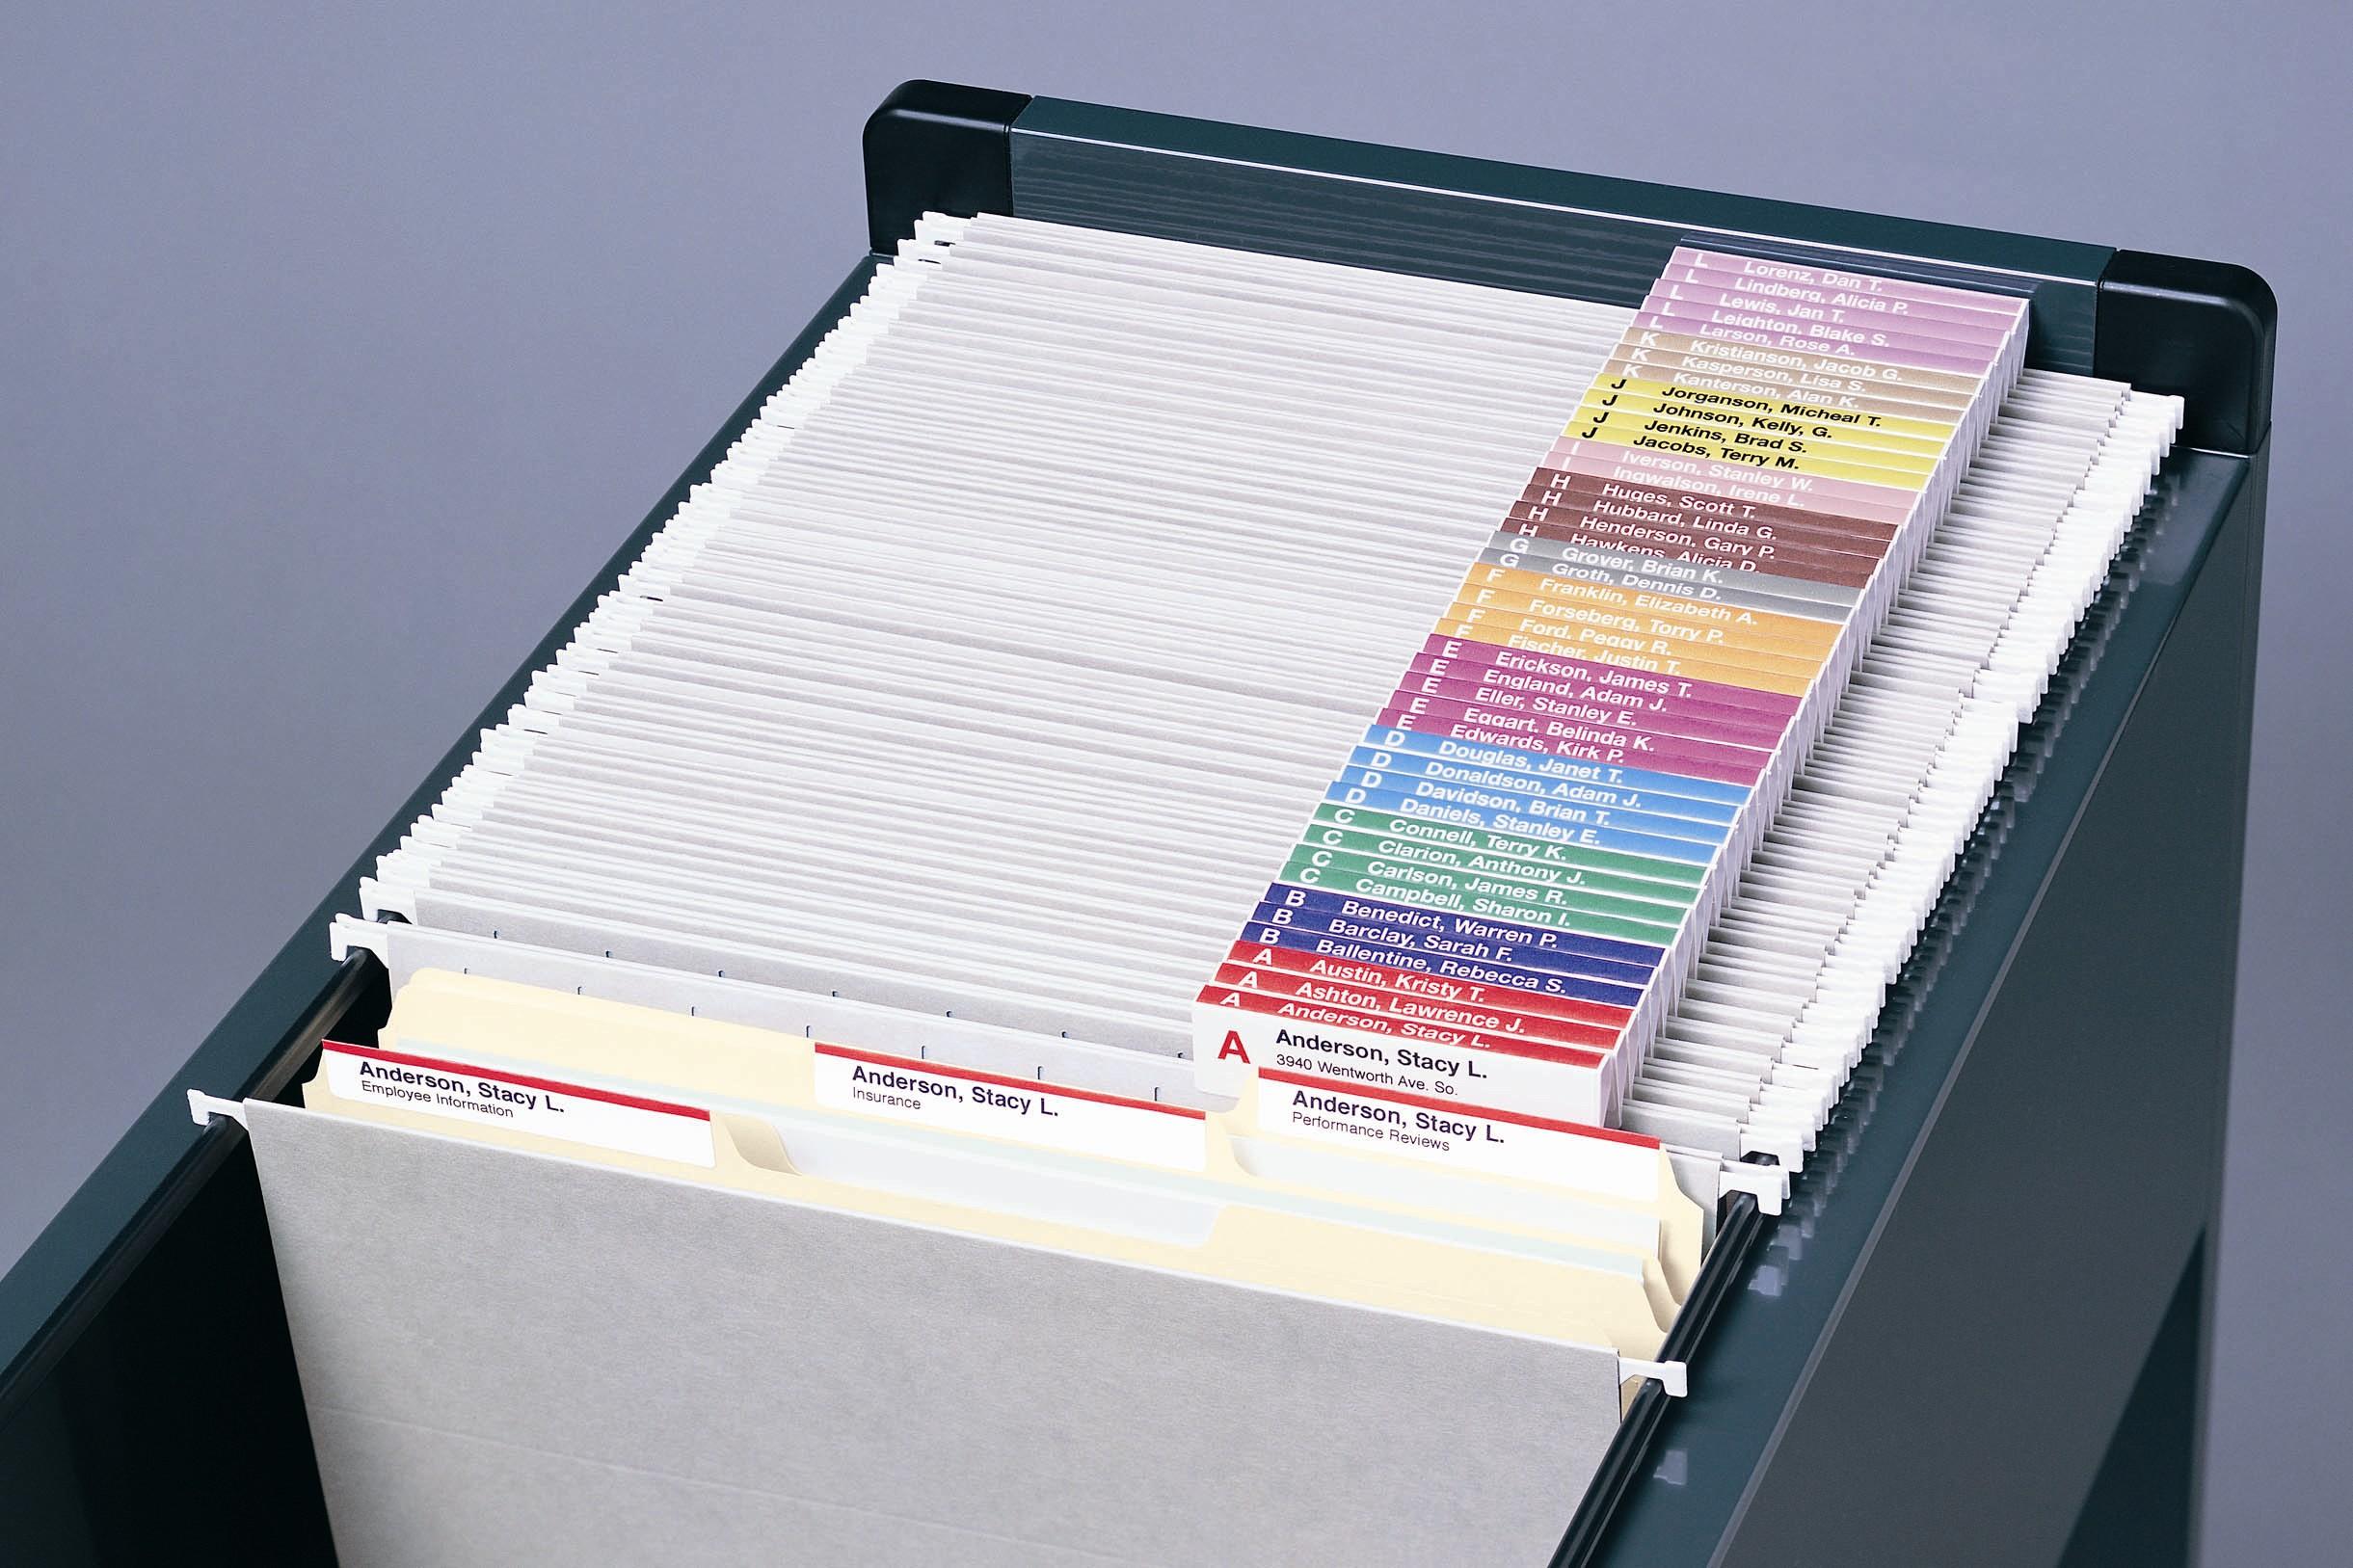 New Smead Viewables 174 4 0 Color Labeling System Makes